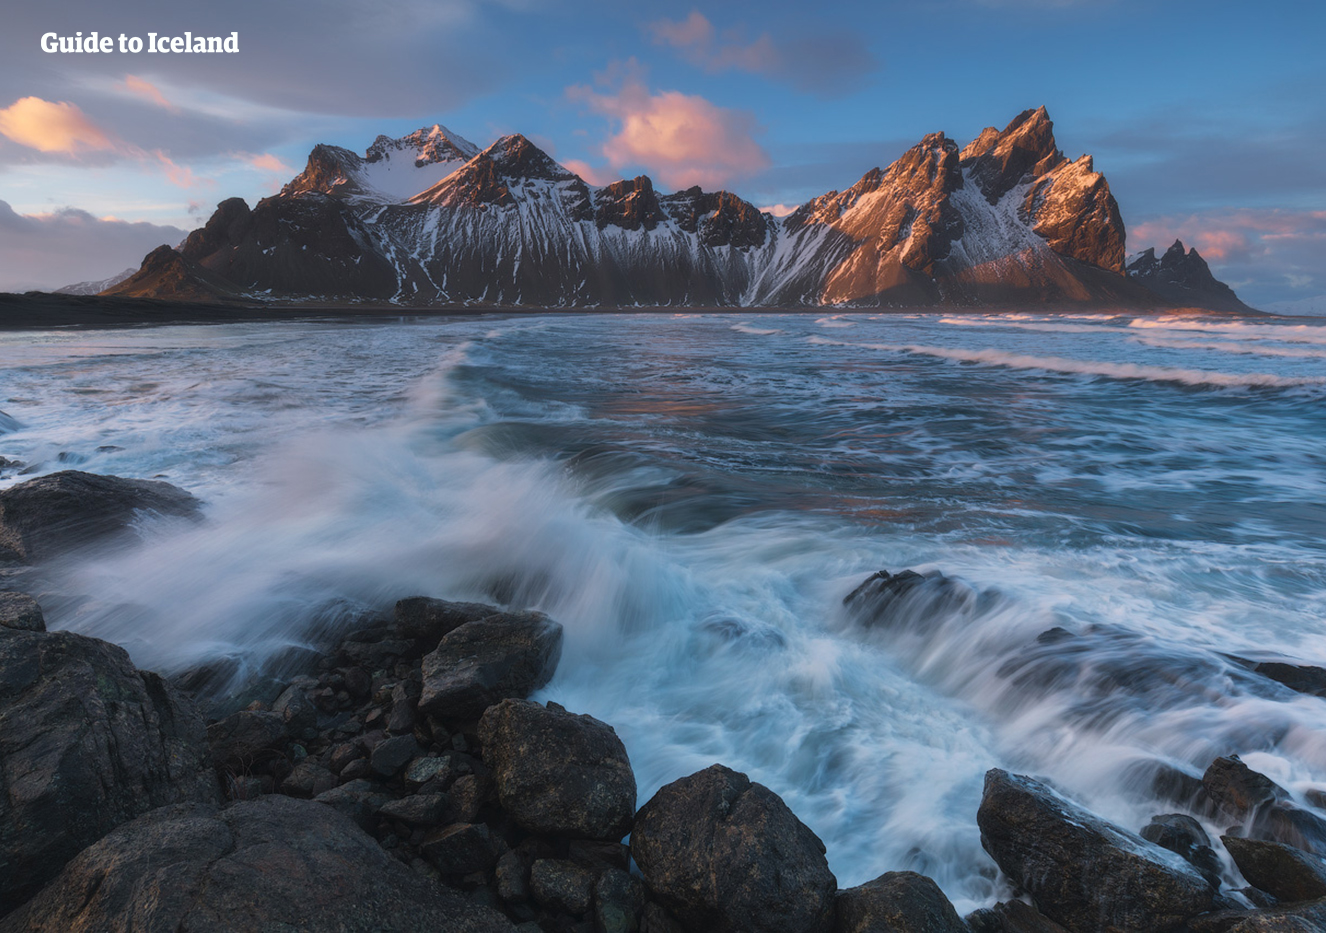 Stokksnes半岛上的Vestrahorn山造型独特,是冰岛东部最著名的山峰之一